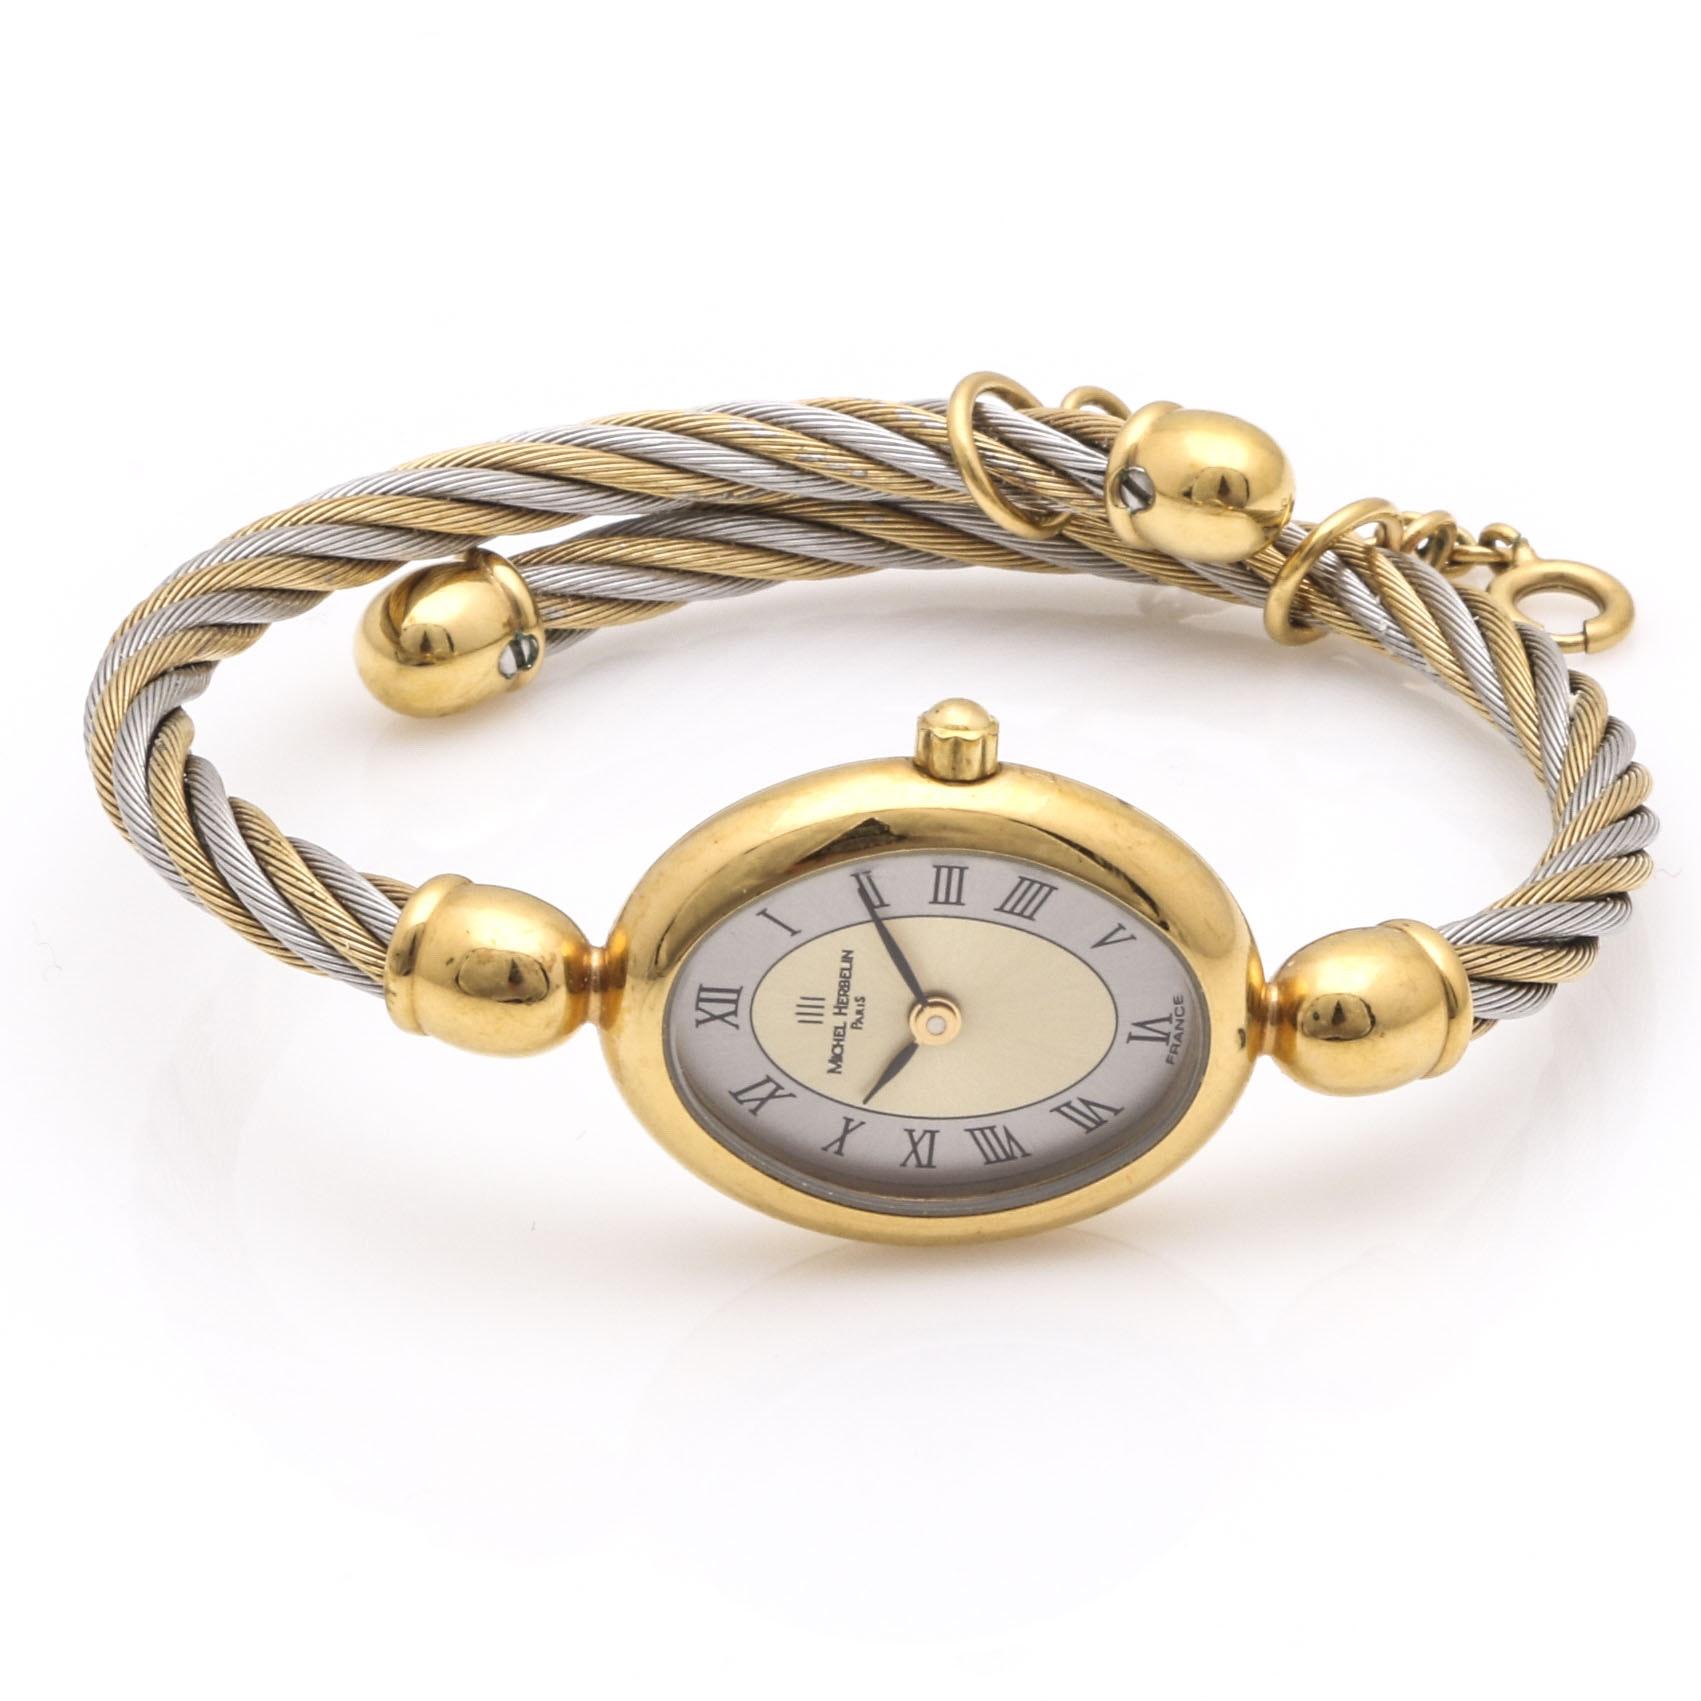 Michel Herbelin Silver and Gold Tone Women's Watch